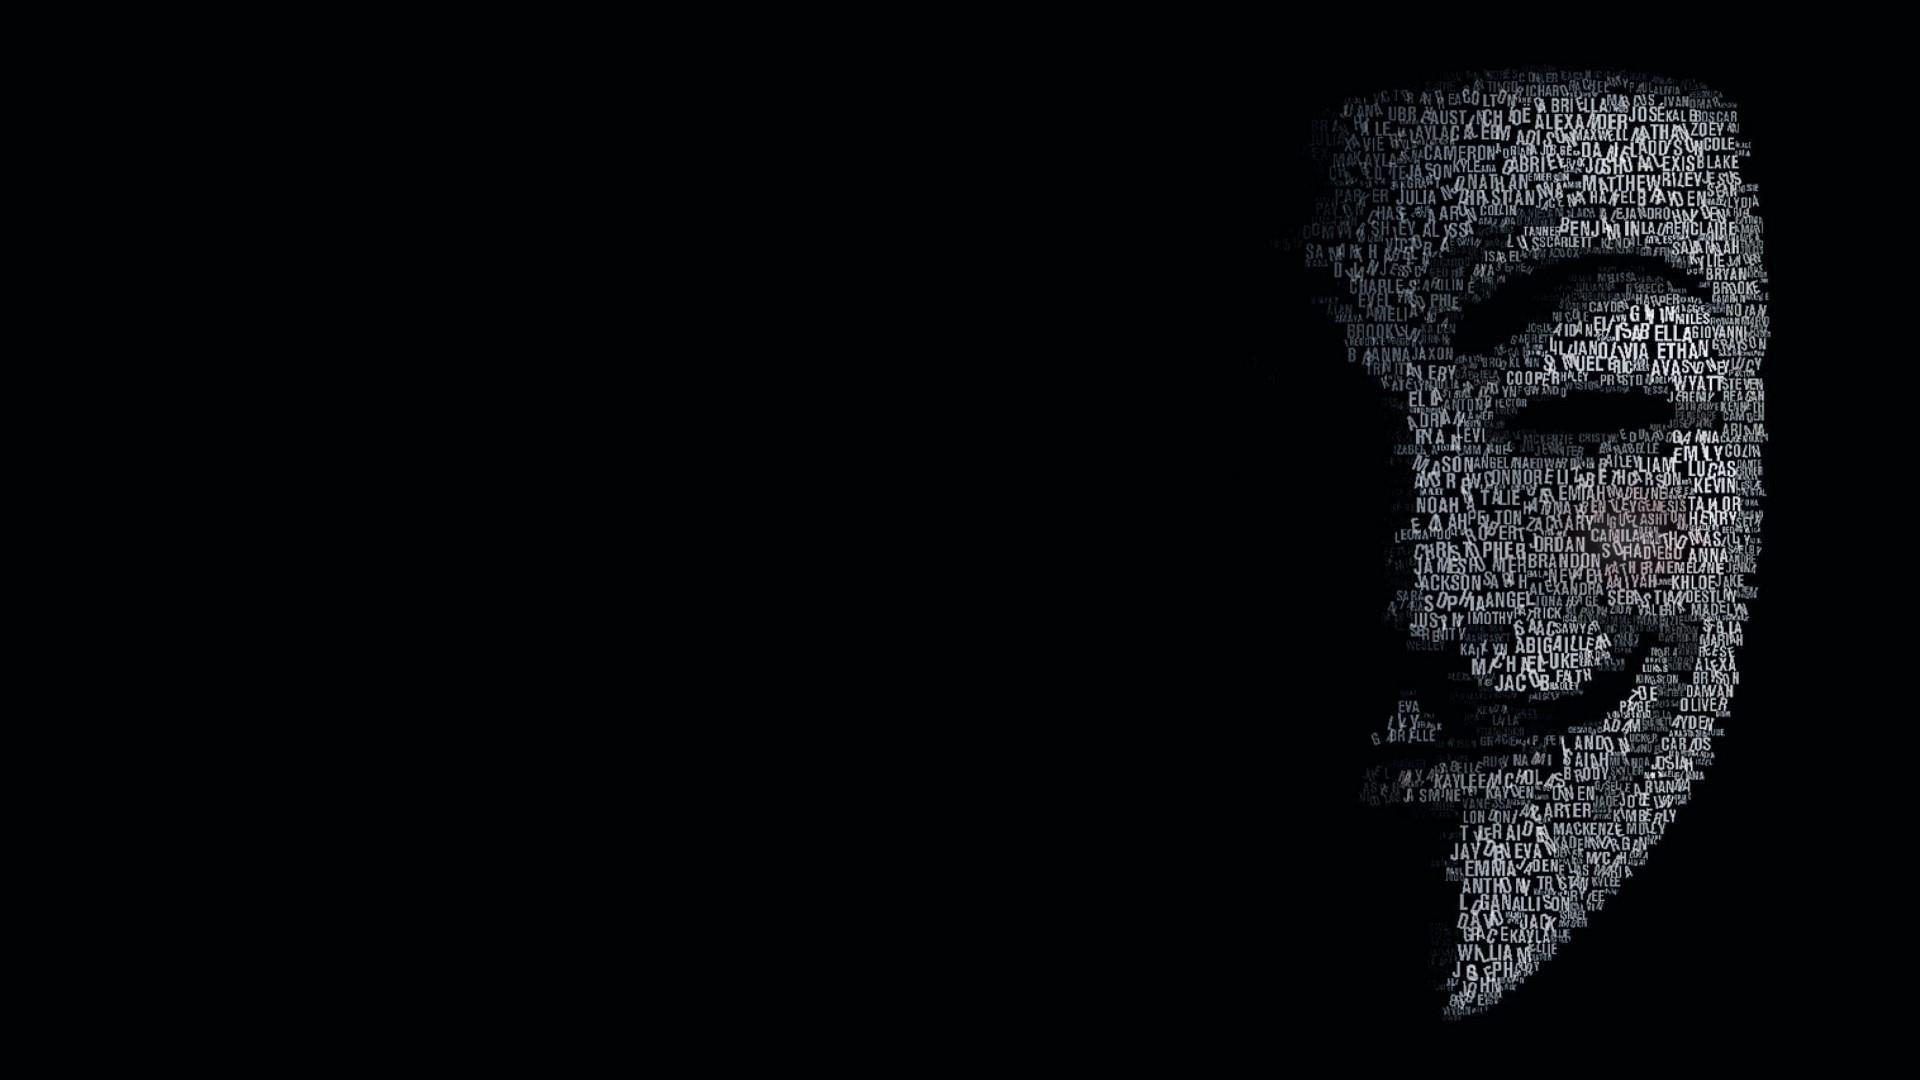 Dark Web Wallpapers Wallpaper Cave